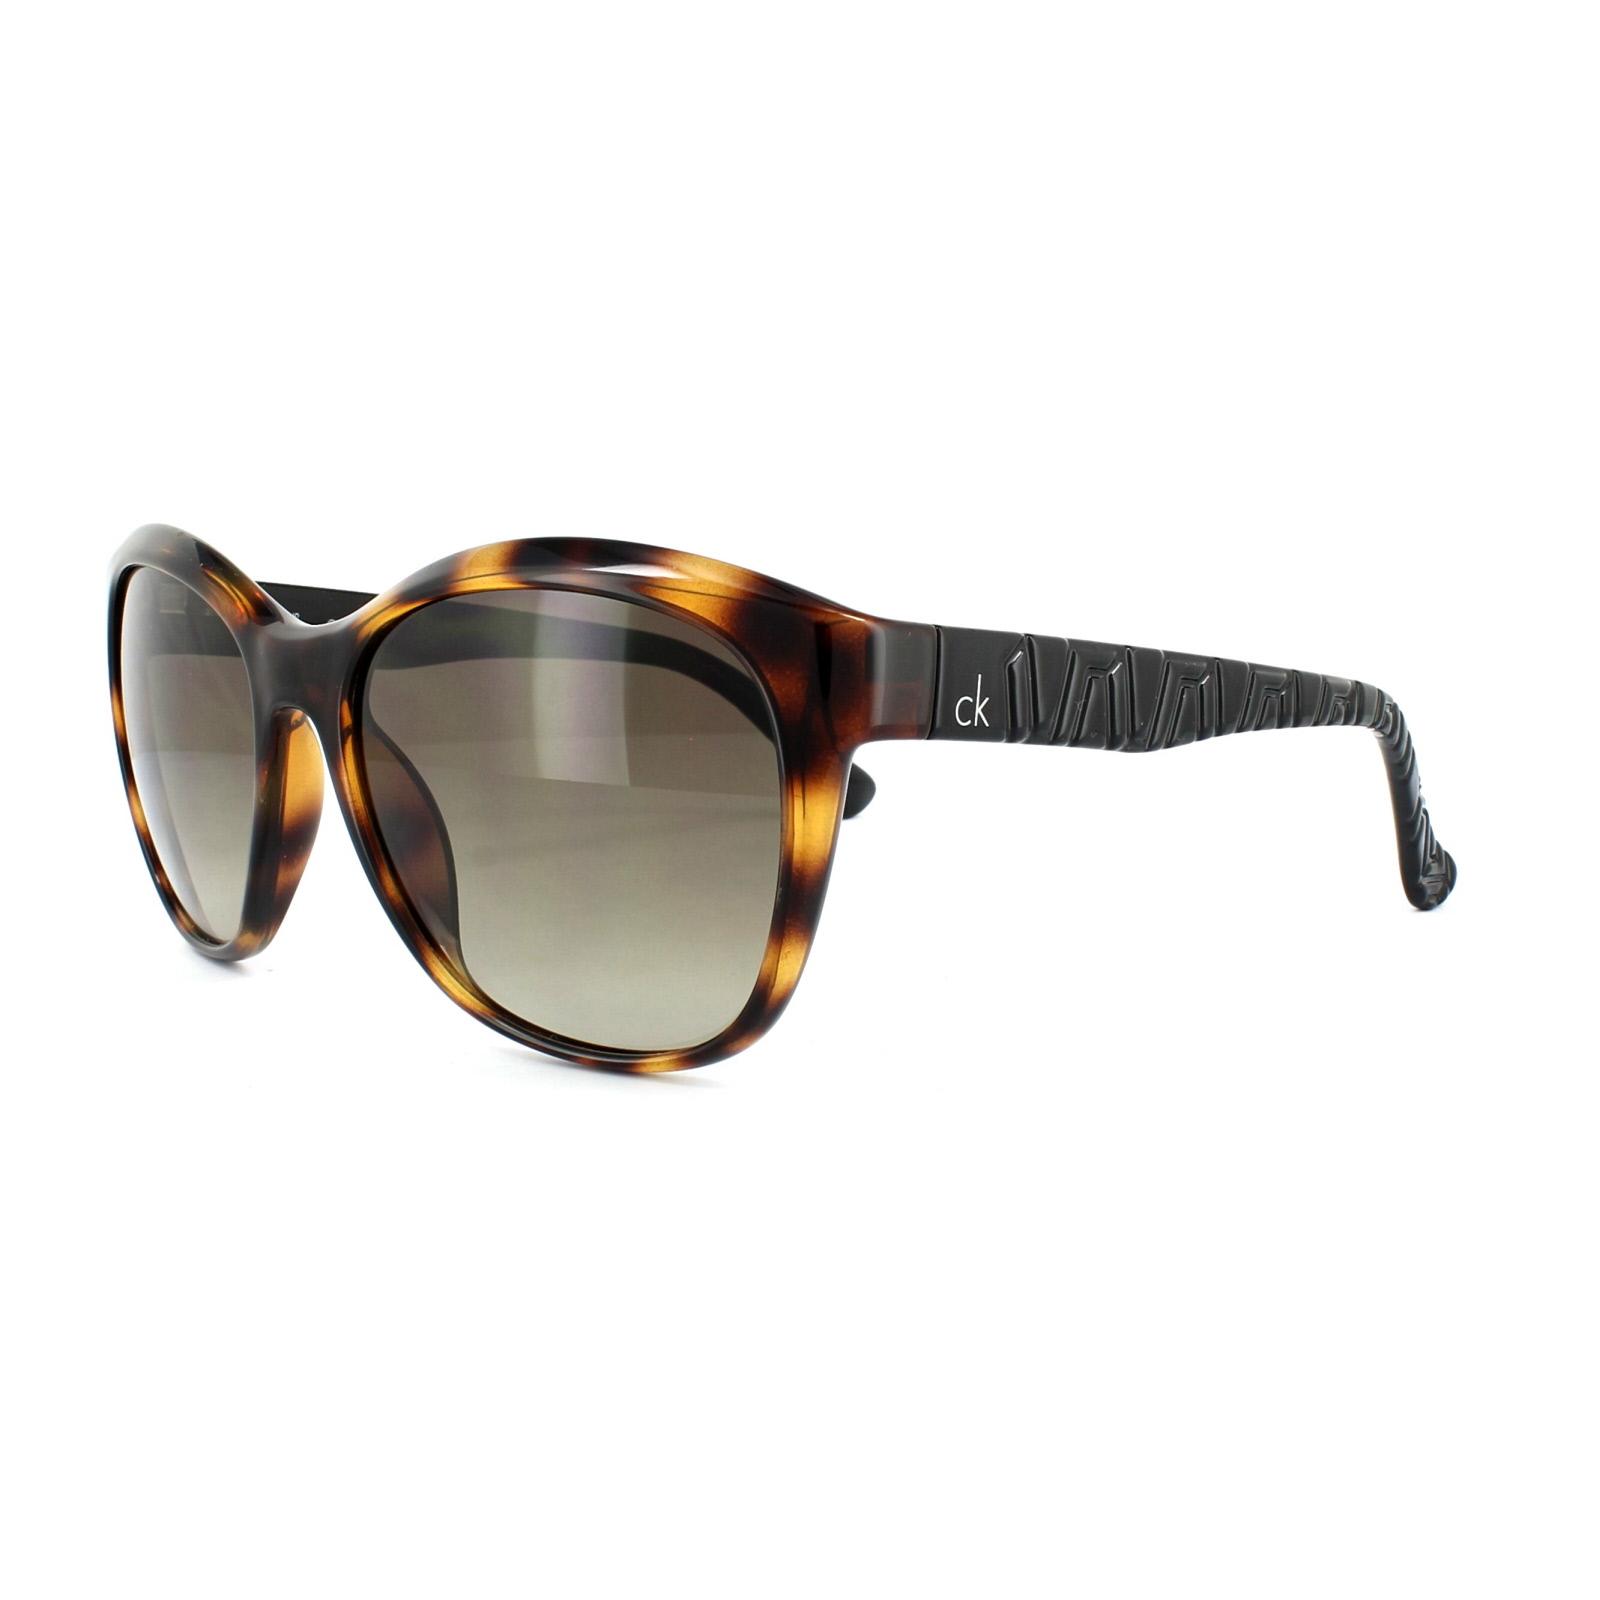 c636bf2edf6 Sentinel Calvin Klein Sunglasses 3168 320 Havana Black Brown Gradient